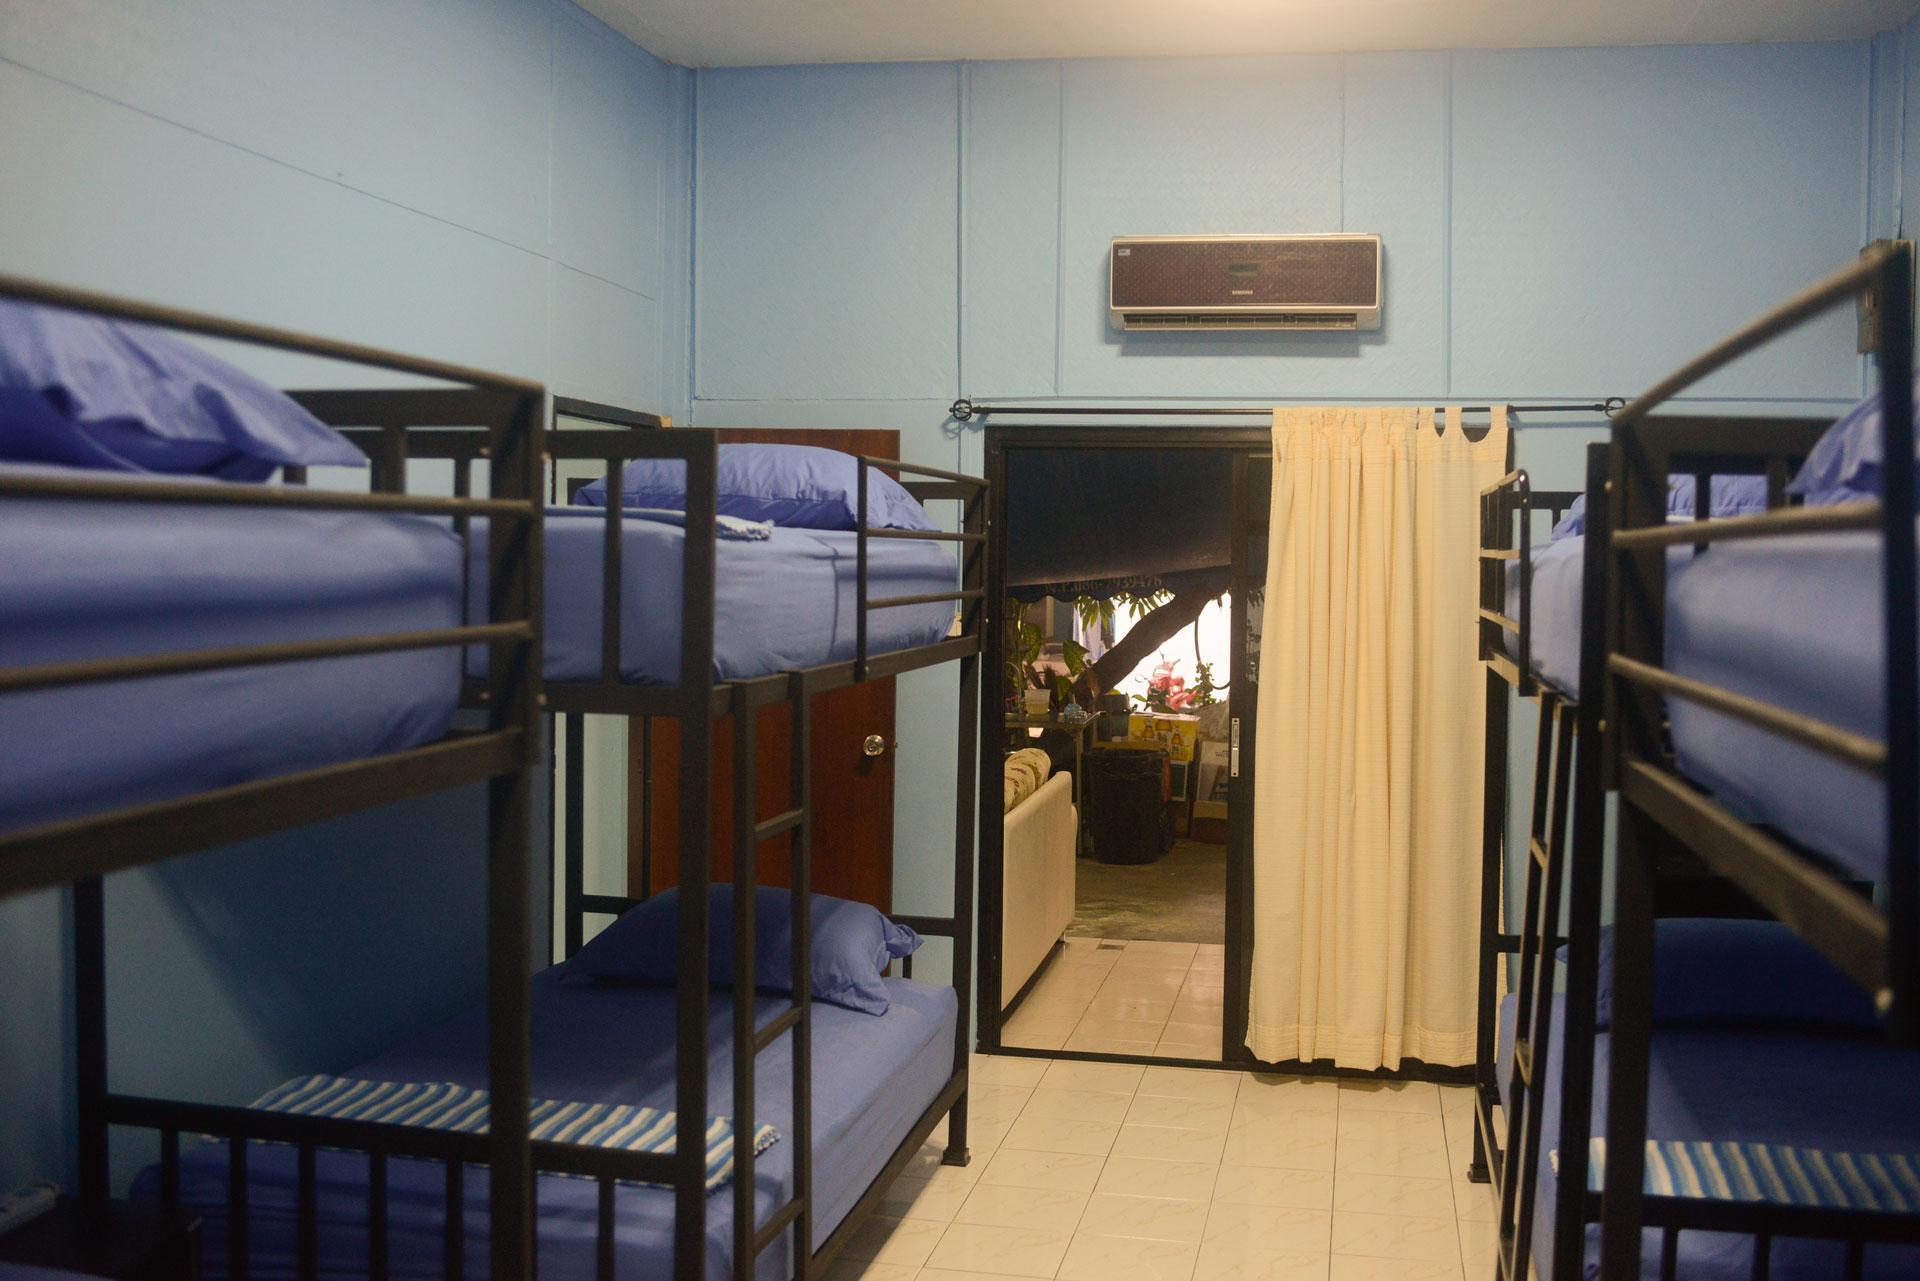 Kingston Jamaica Hostel 2